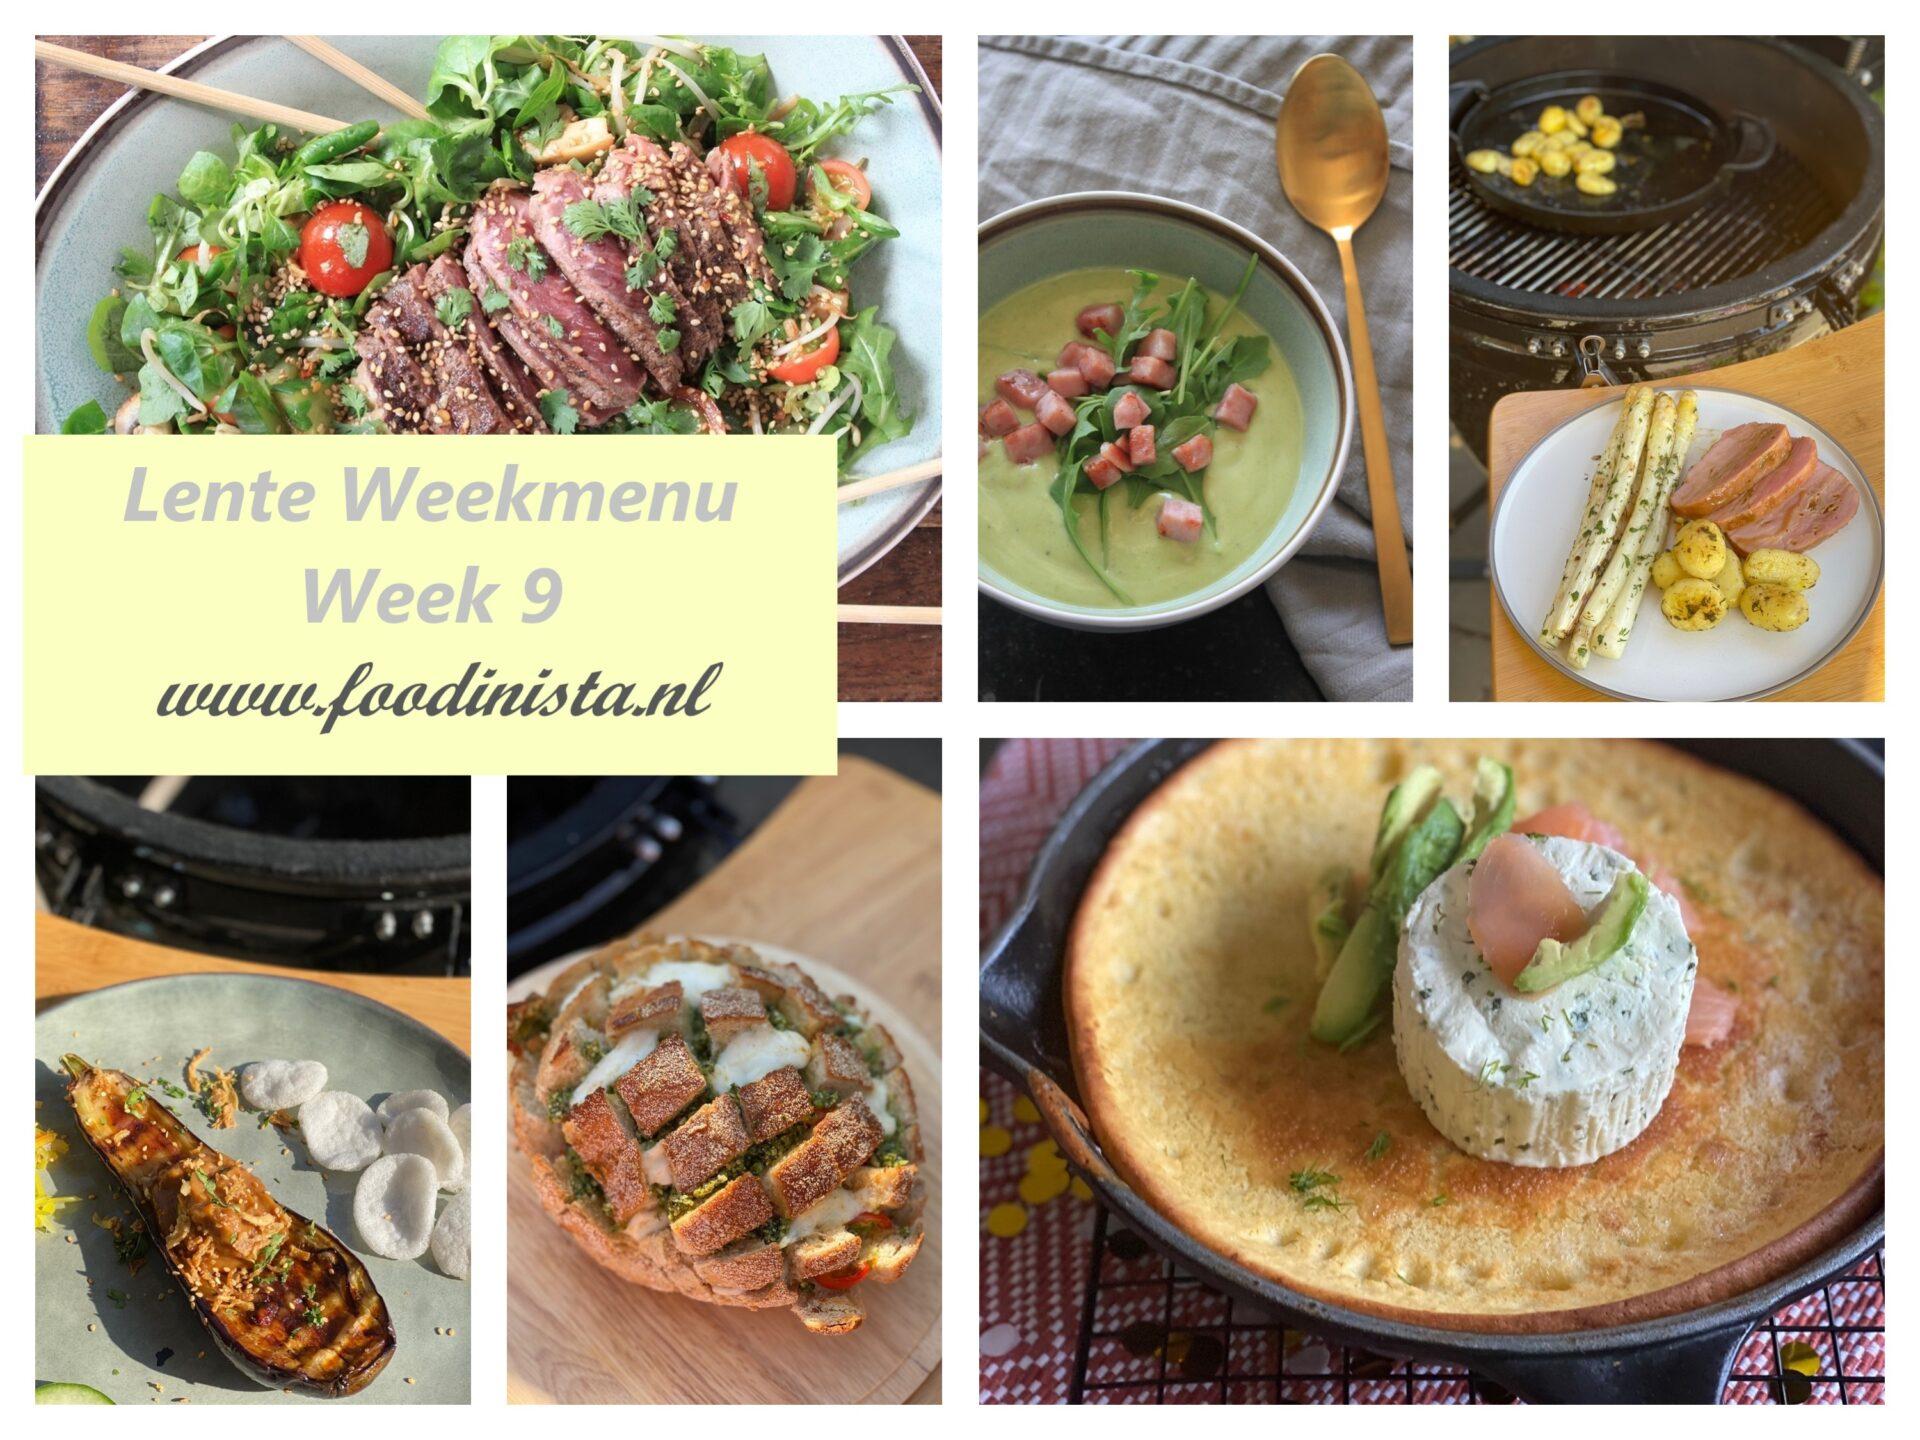 Foodinista weekmenu – Wat eten we deze week? – Weekmenu Week 9 Lente 2021